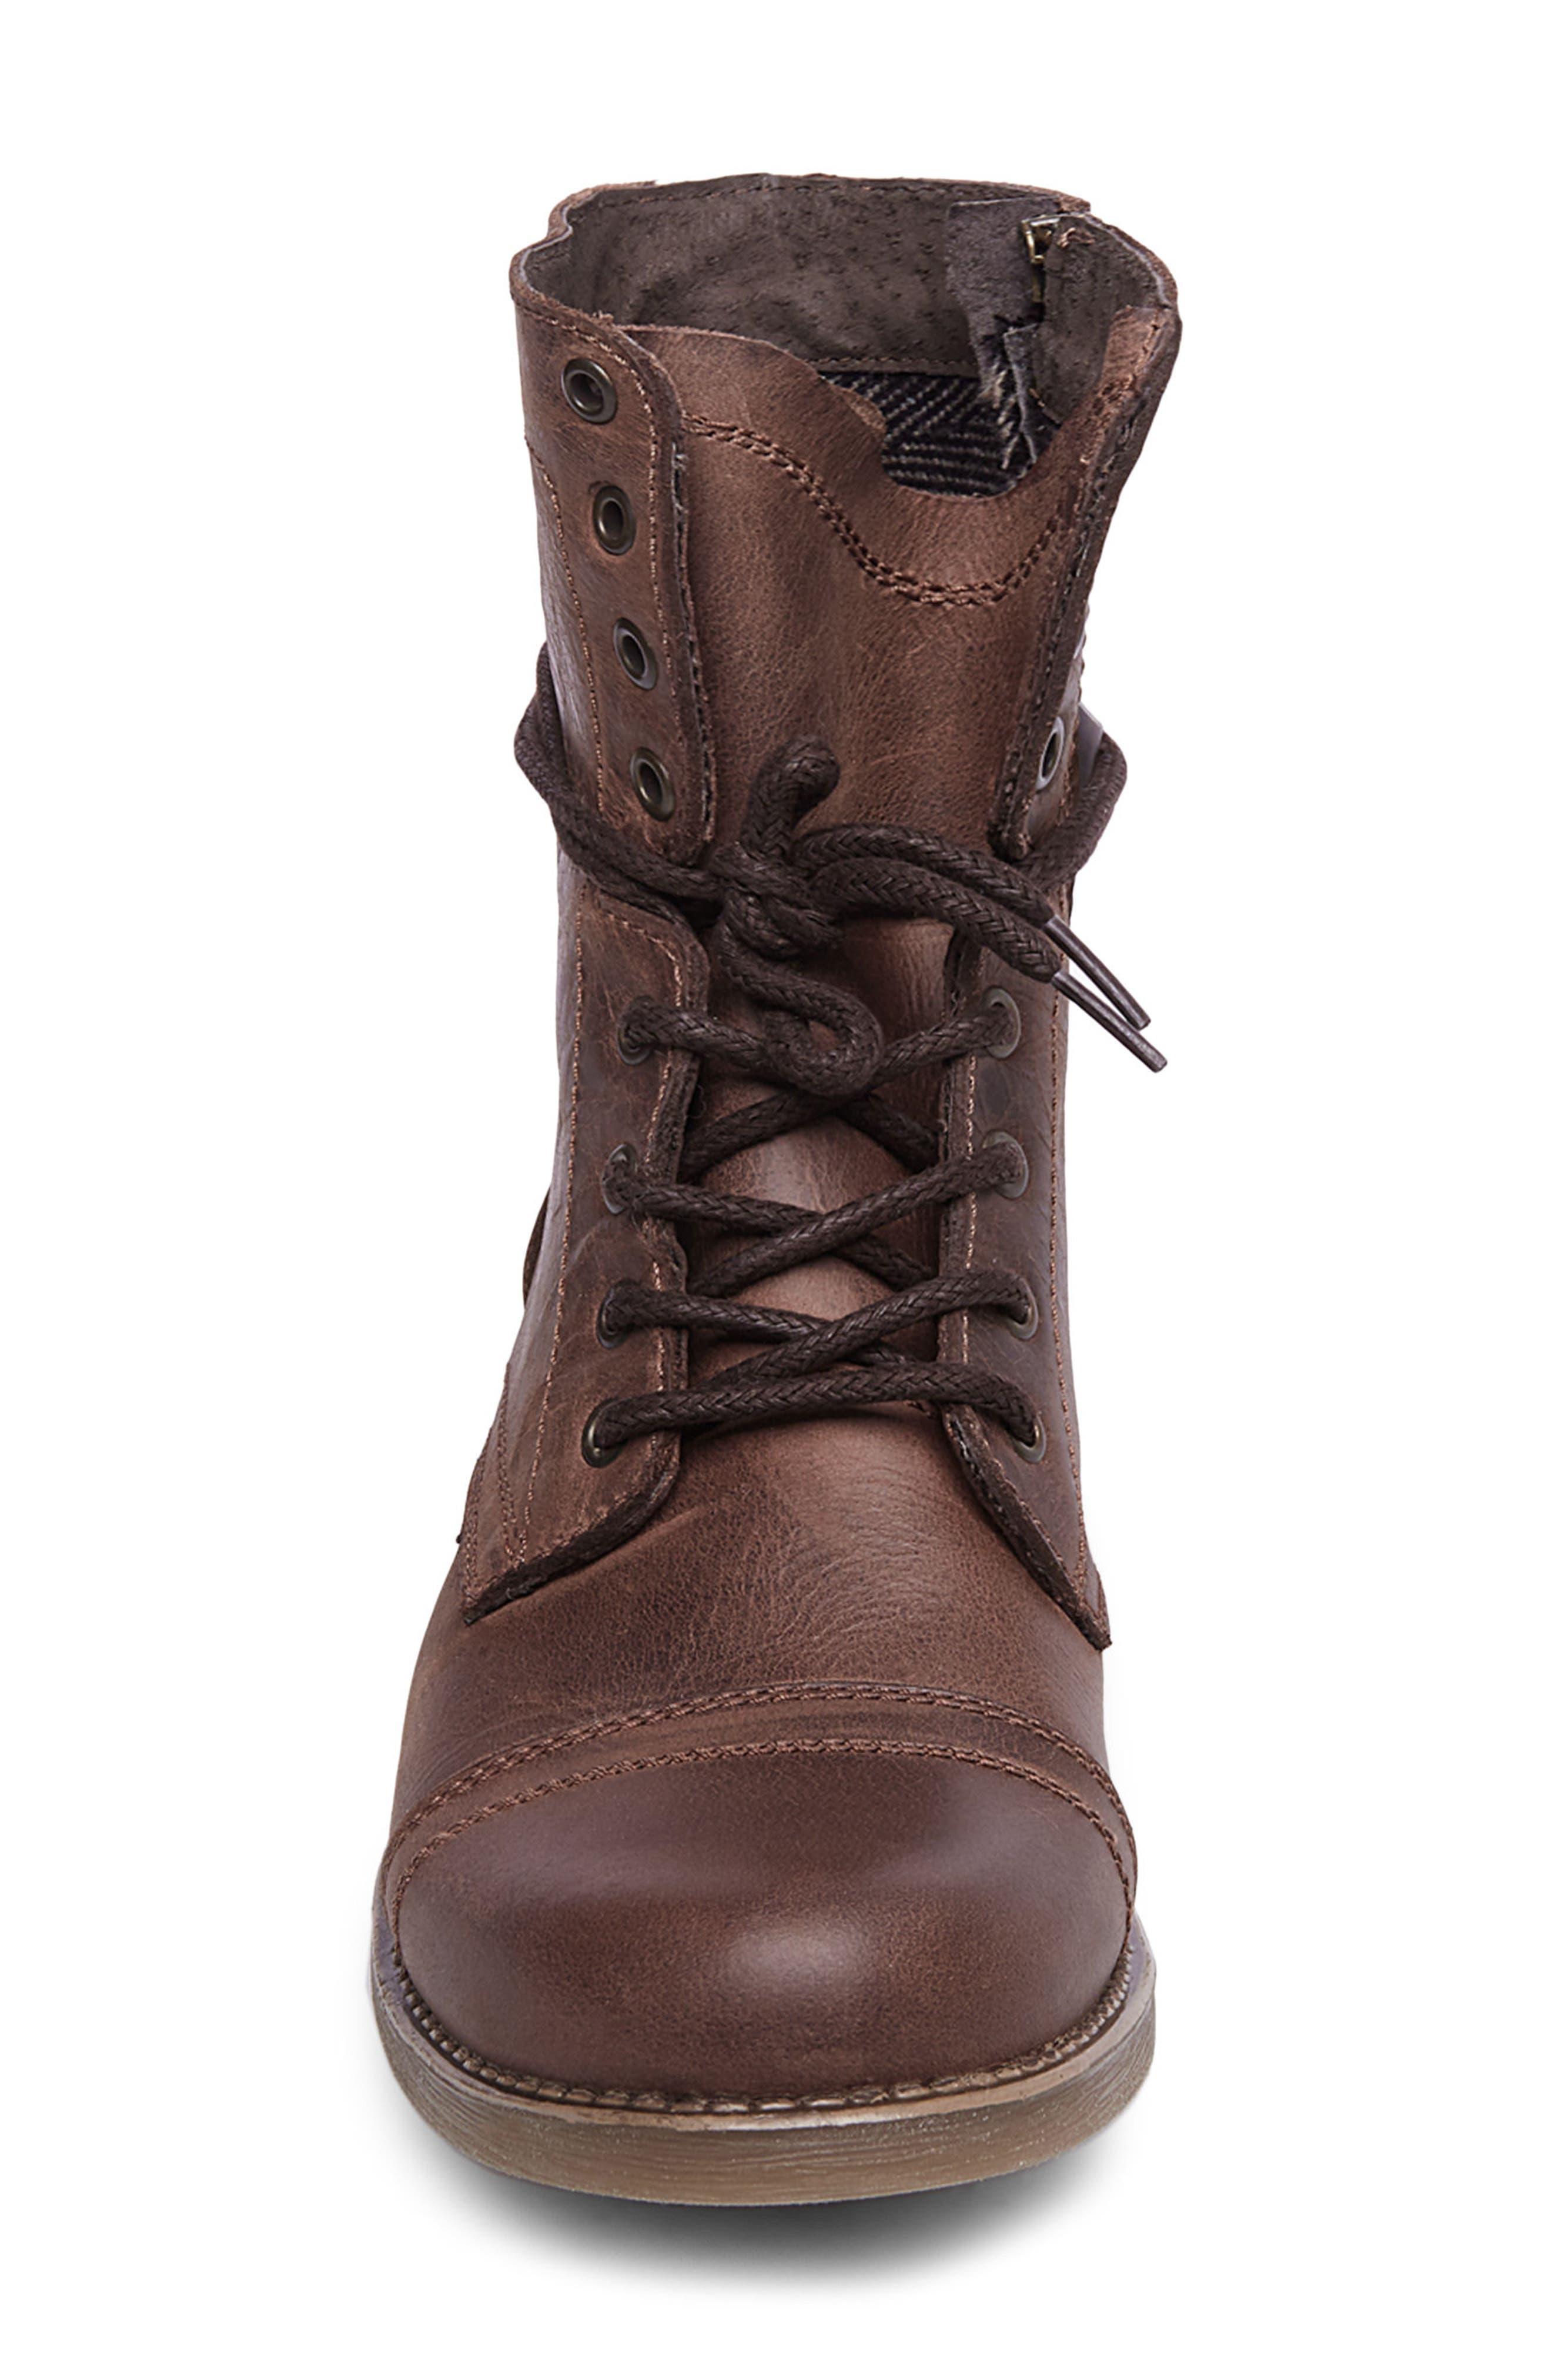 STEVE MADDEN, Troopah-C Cap Toe Boot, Alternate thumbnail 4, color, BROWN LEATHER